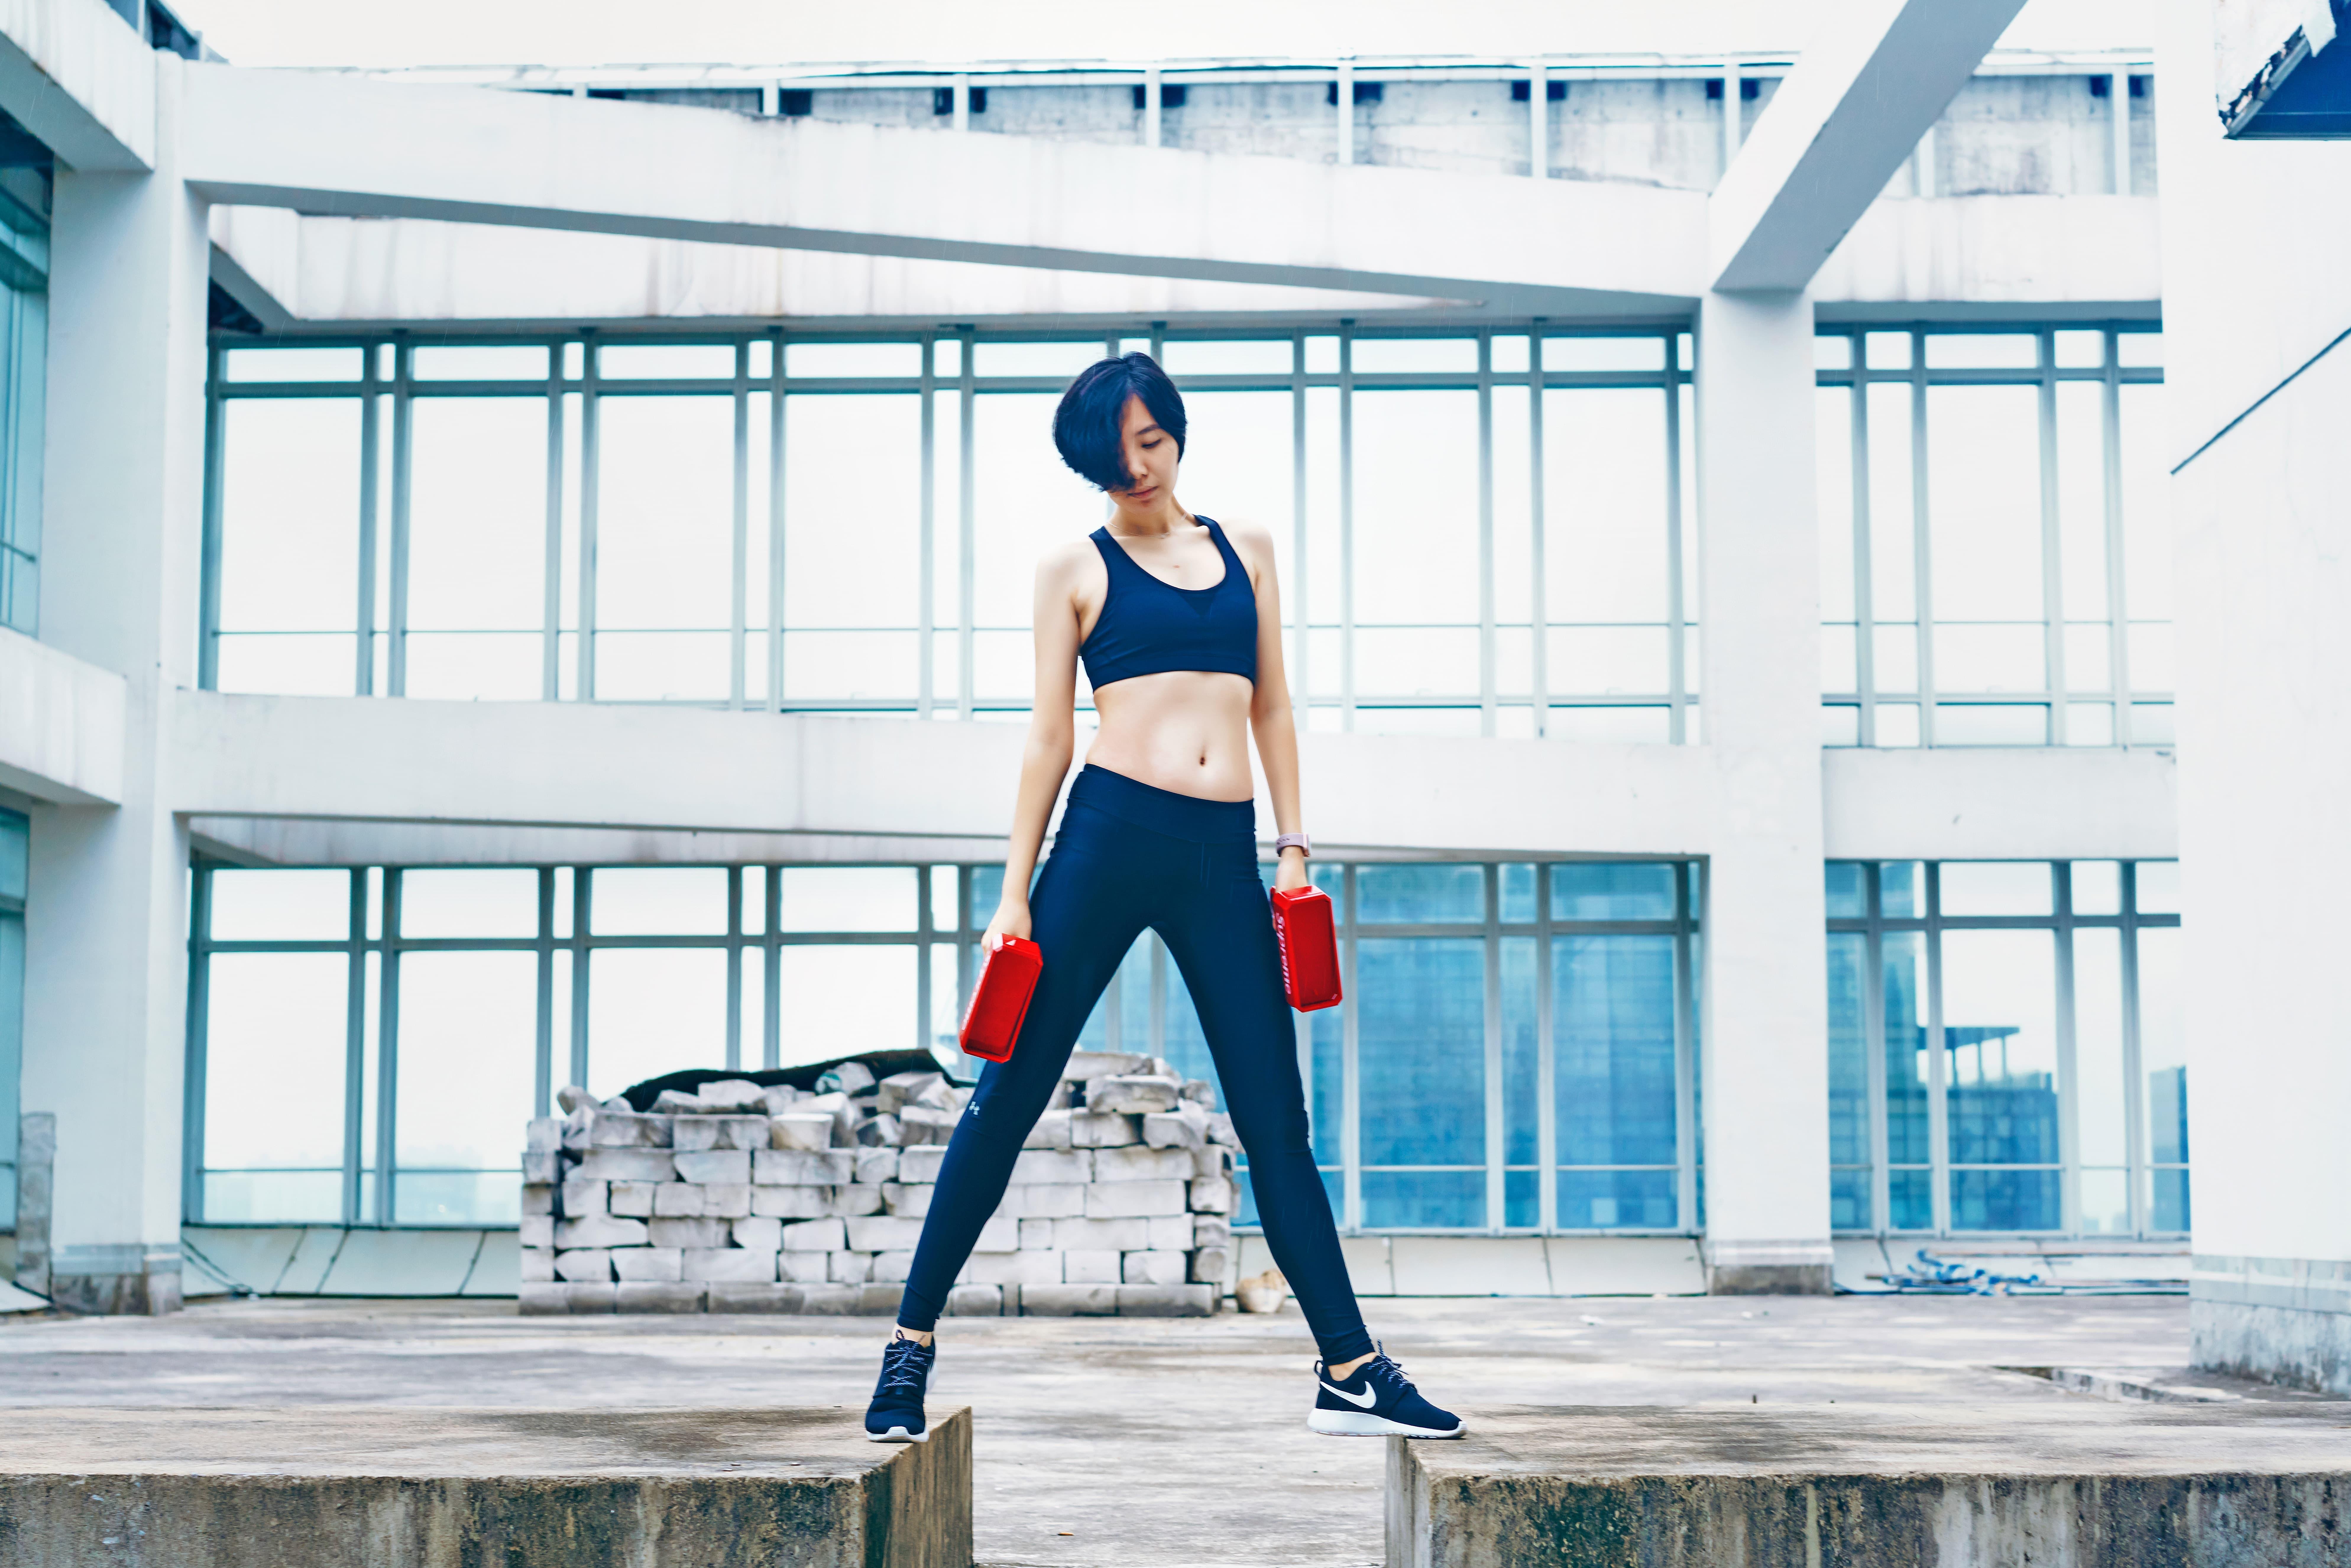 10 Weird But Effective Ways to Lose Weight